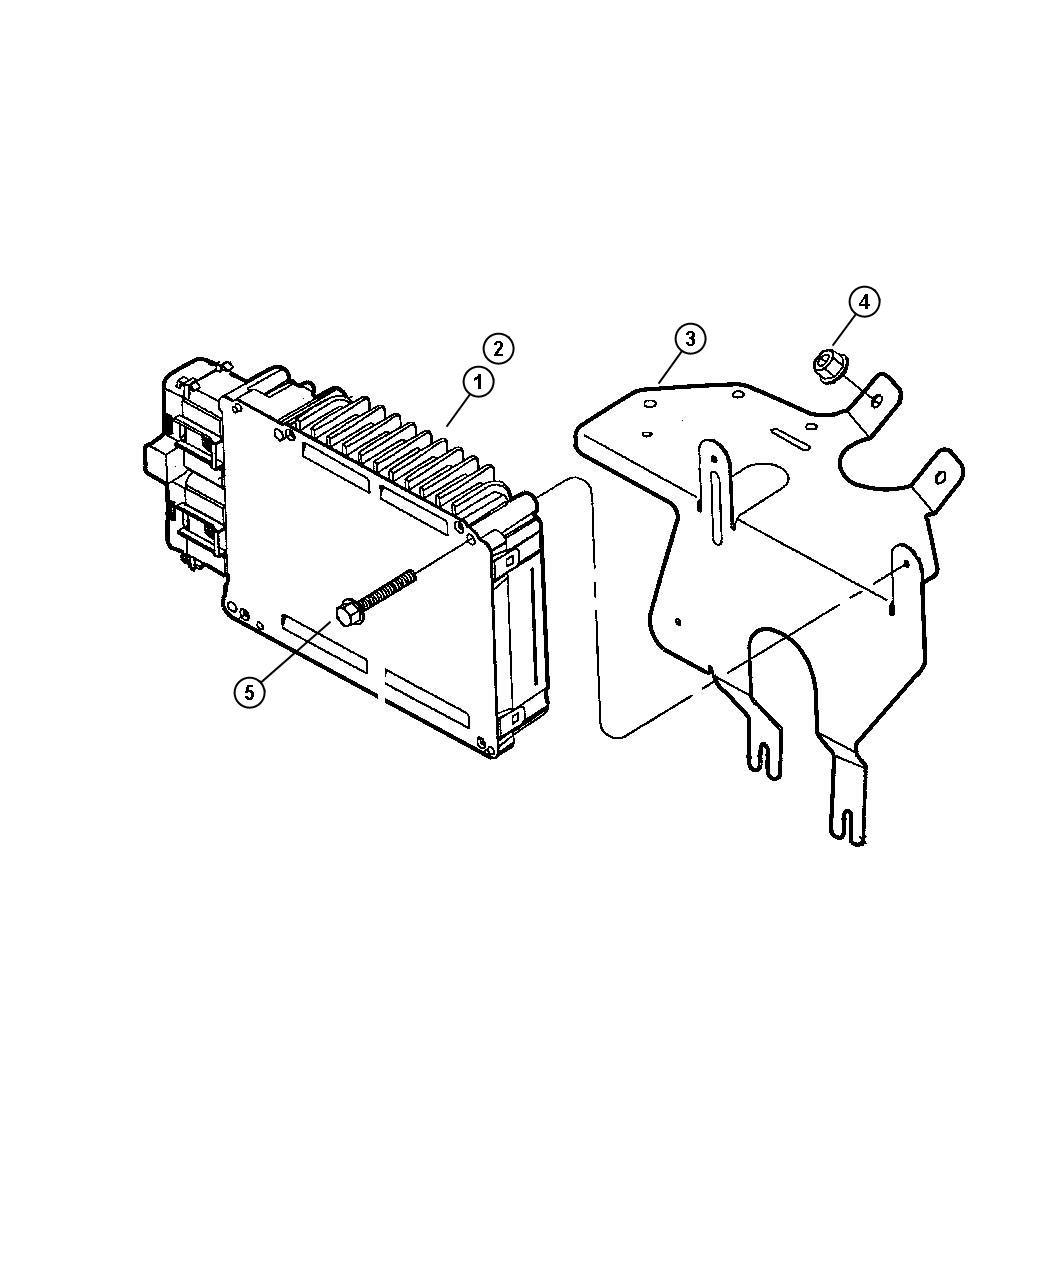 Chrysler Pacifica Module. Powertrain control. Generic